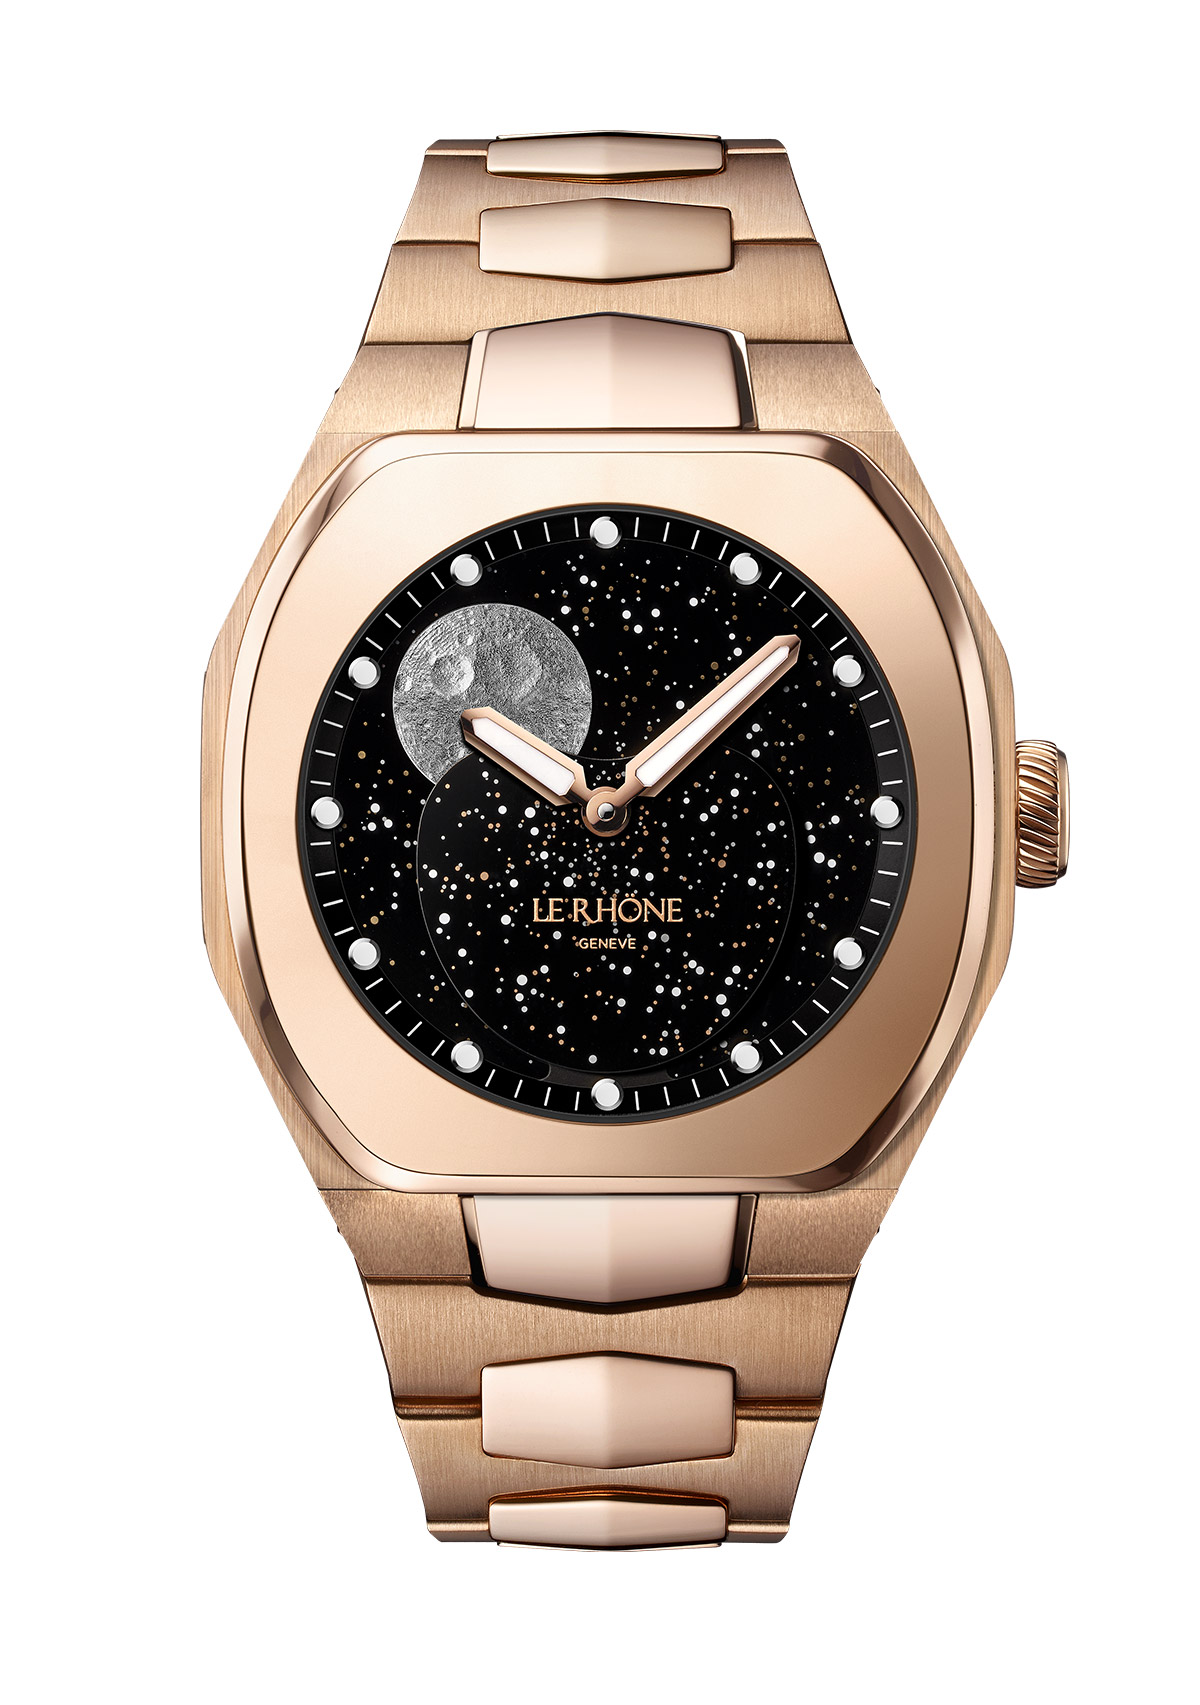 moon-41-le-rhone-watch-H3PG091-1-P00D